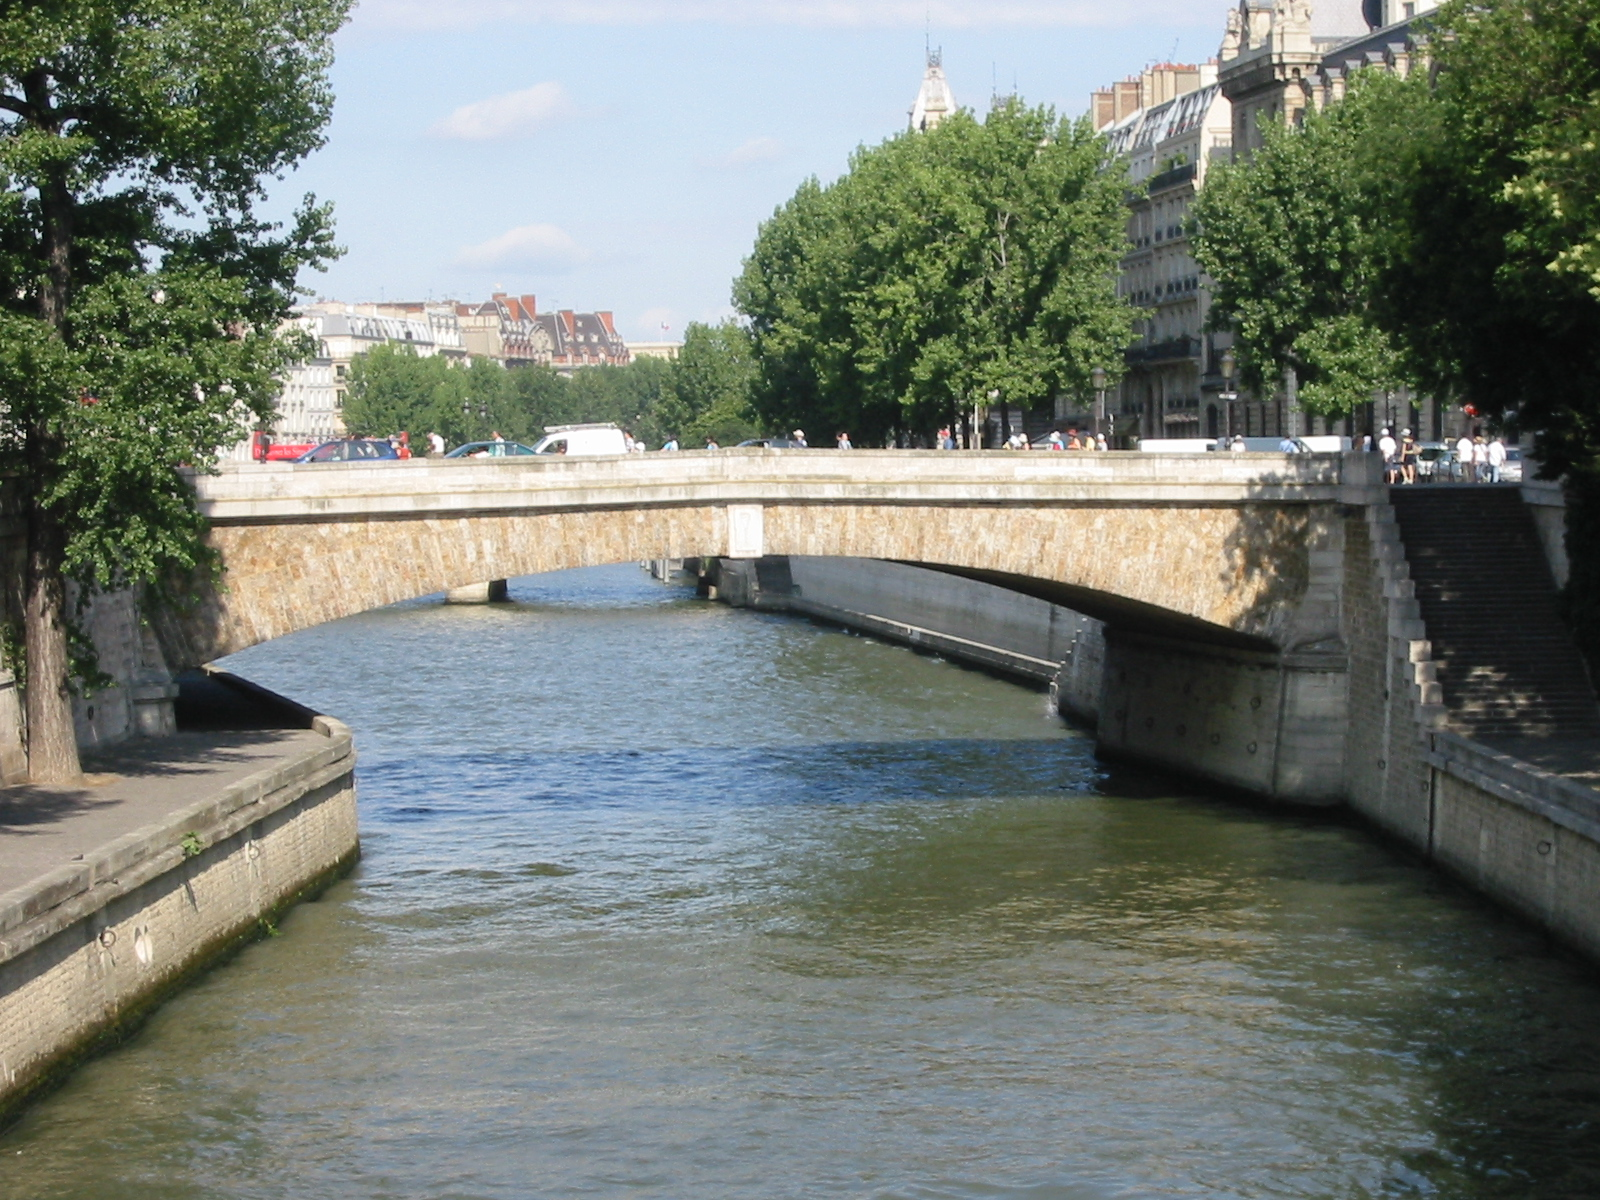 Petit pont wikipedia - Petit pont en bois ...